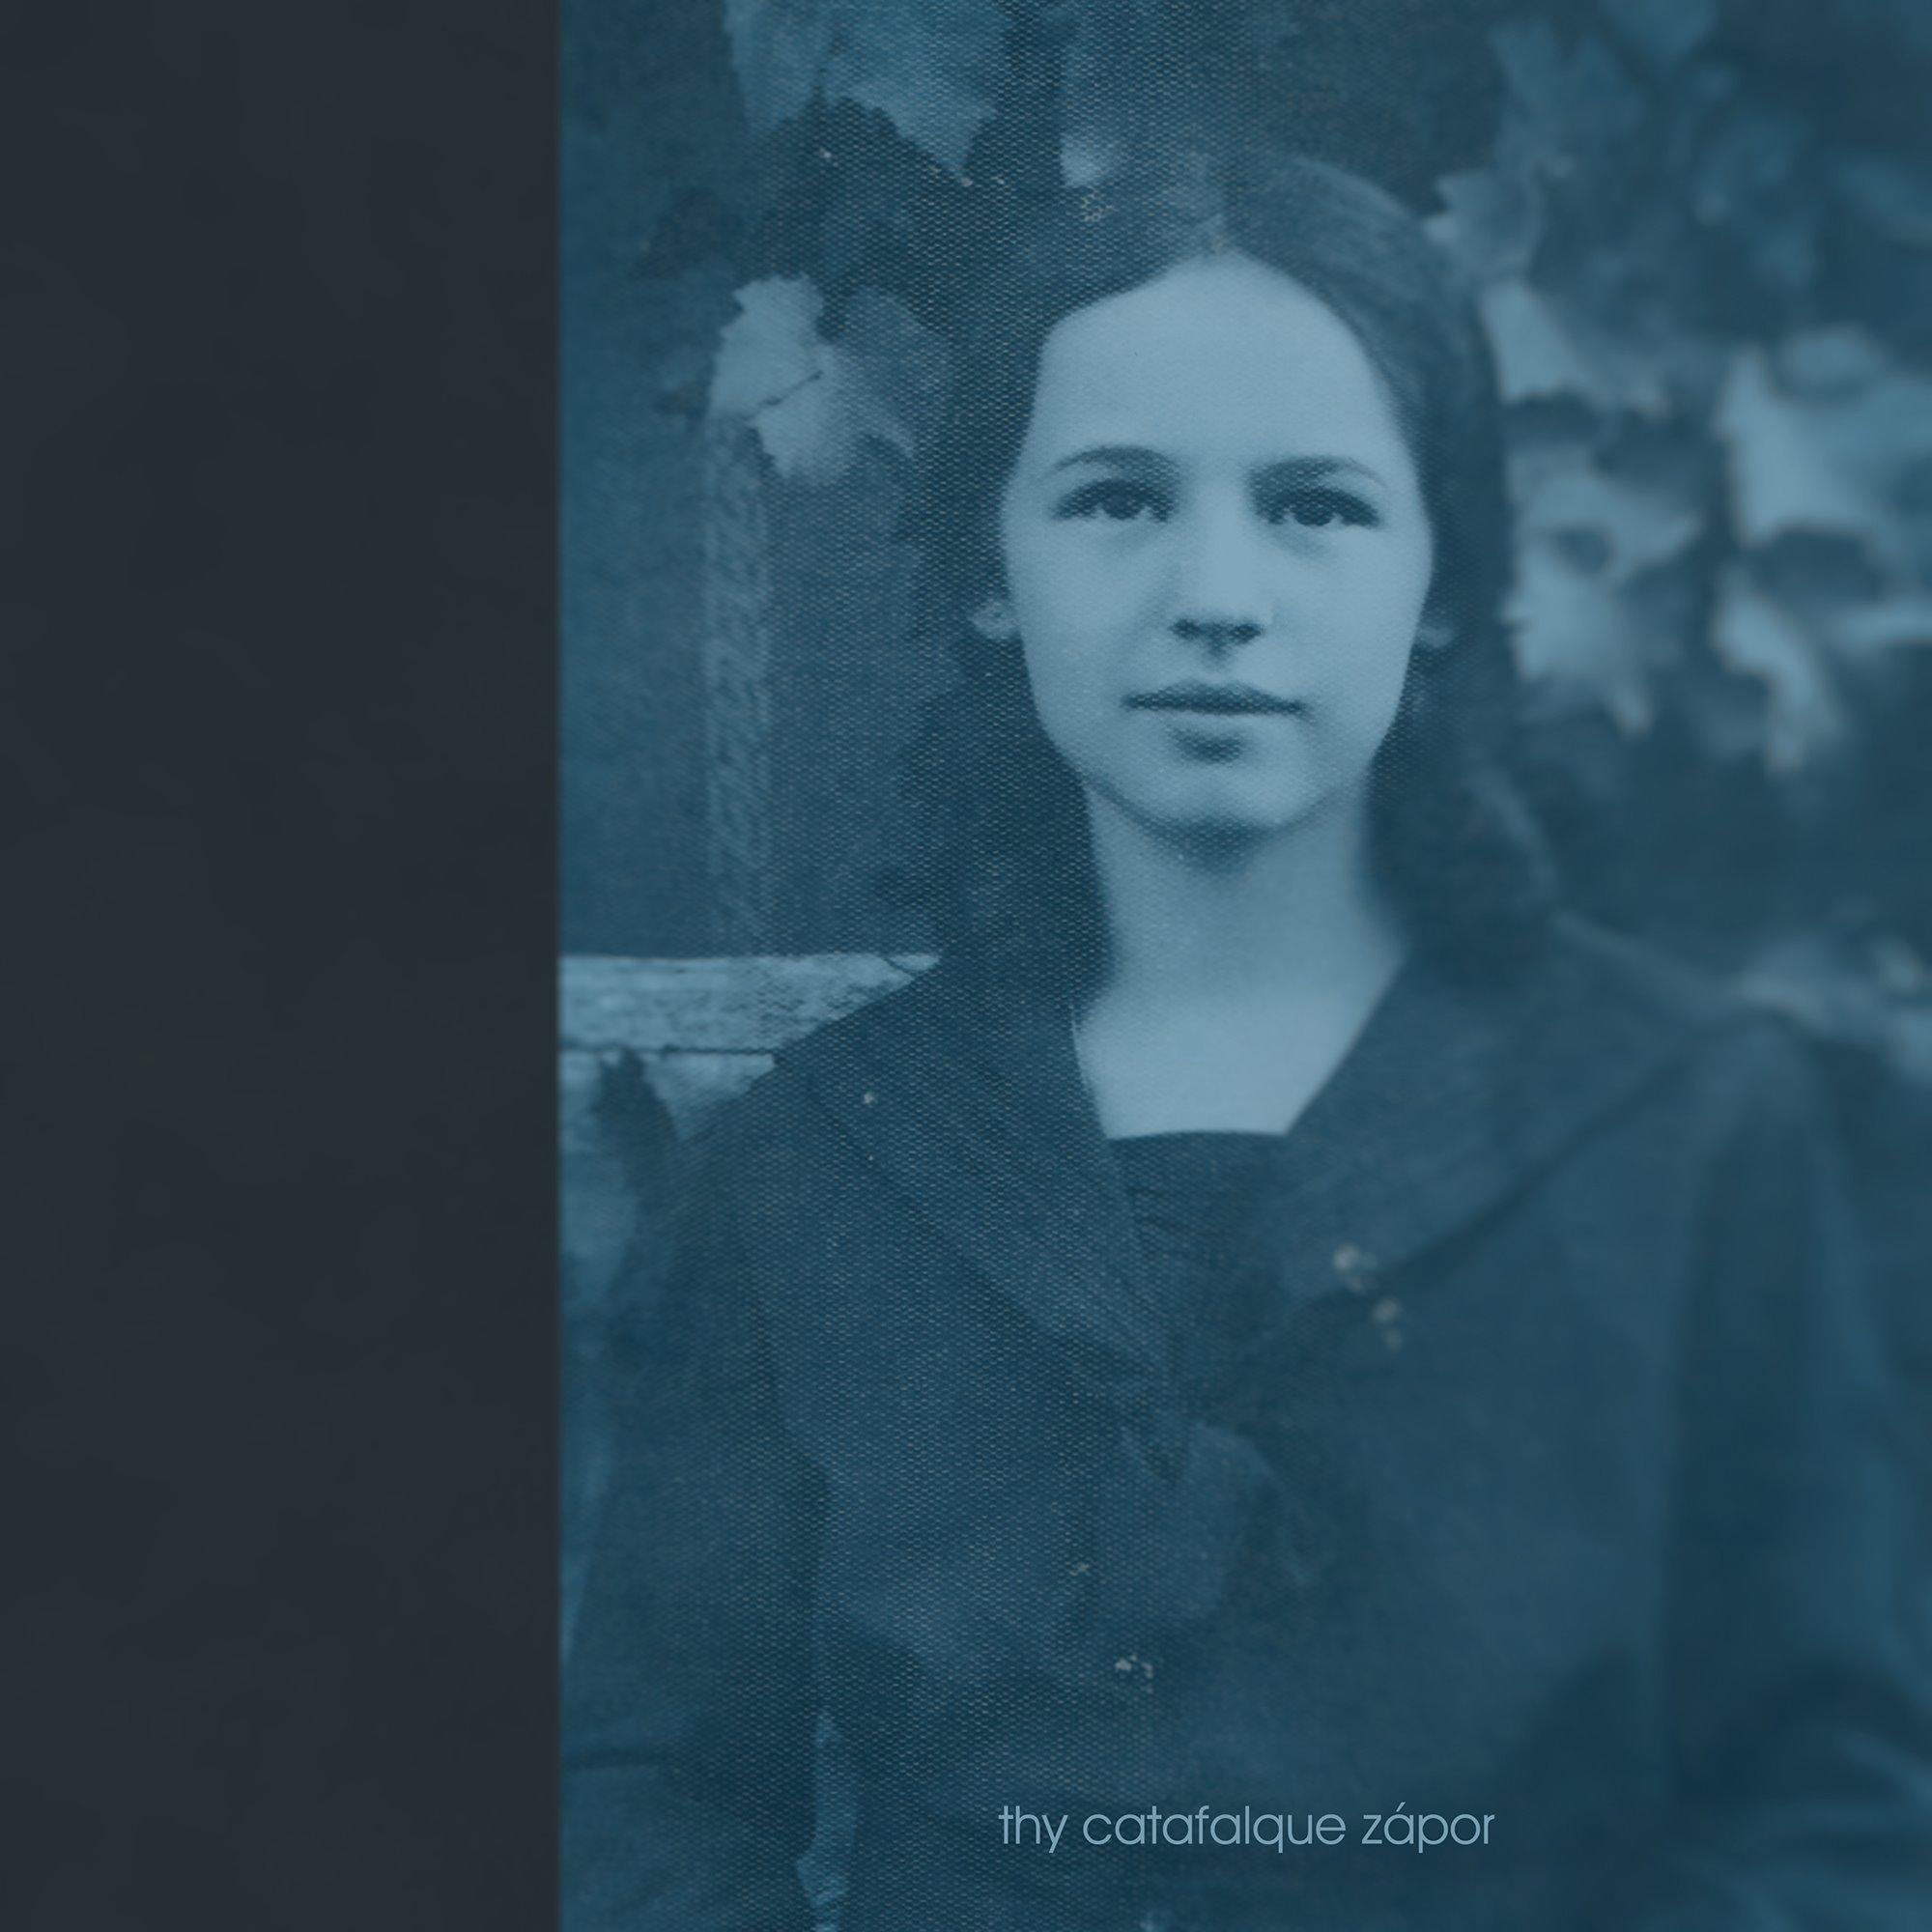 Régi dalok, új dimenziók – Thy Catafalque: Zápor EP